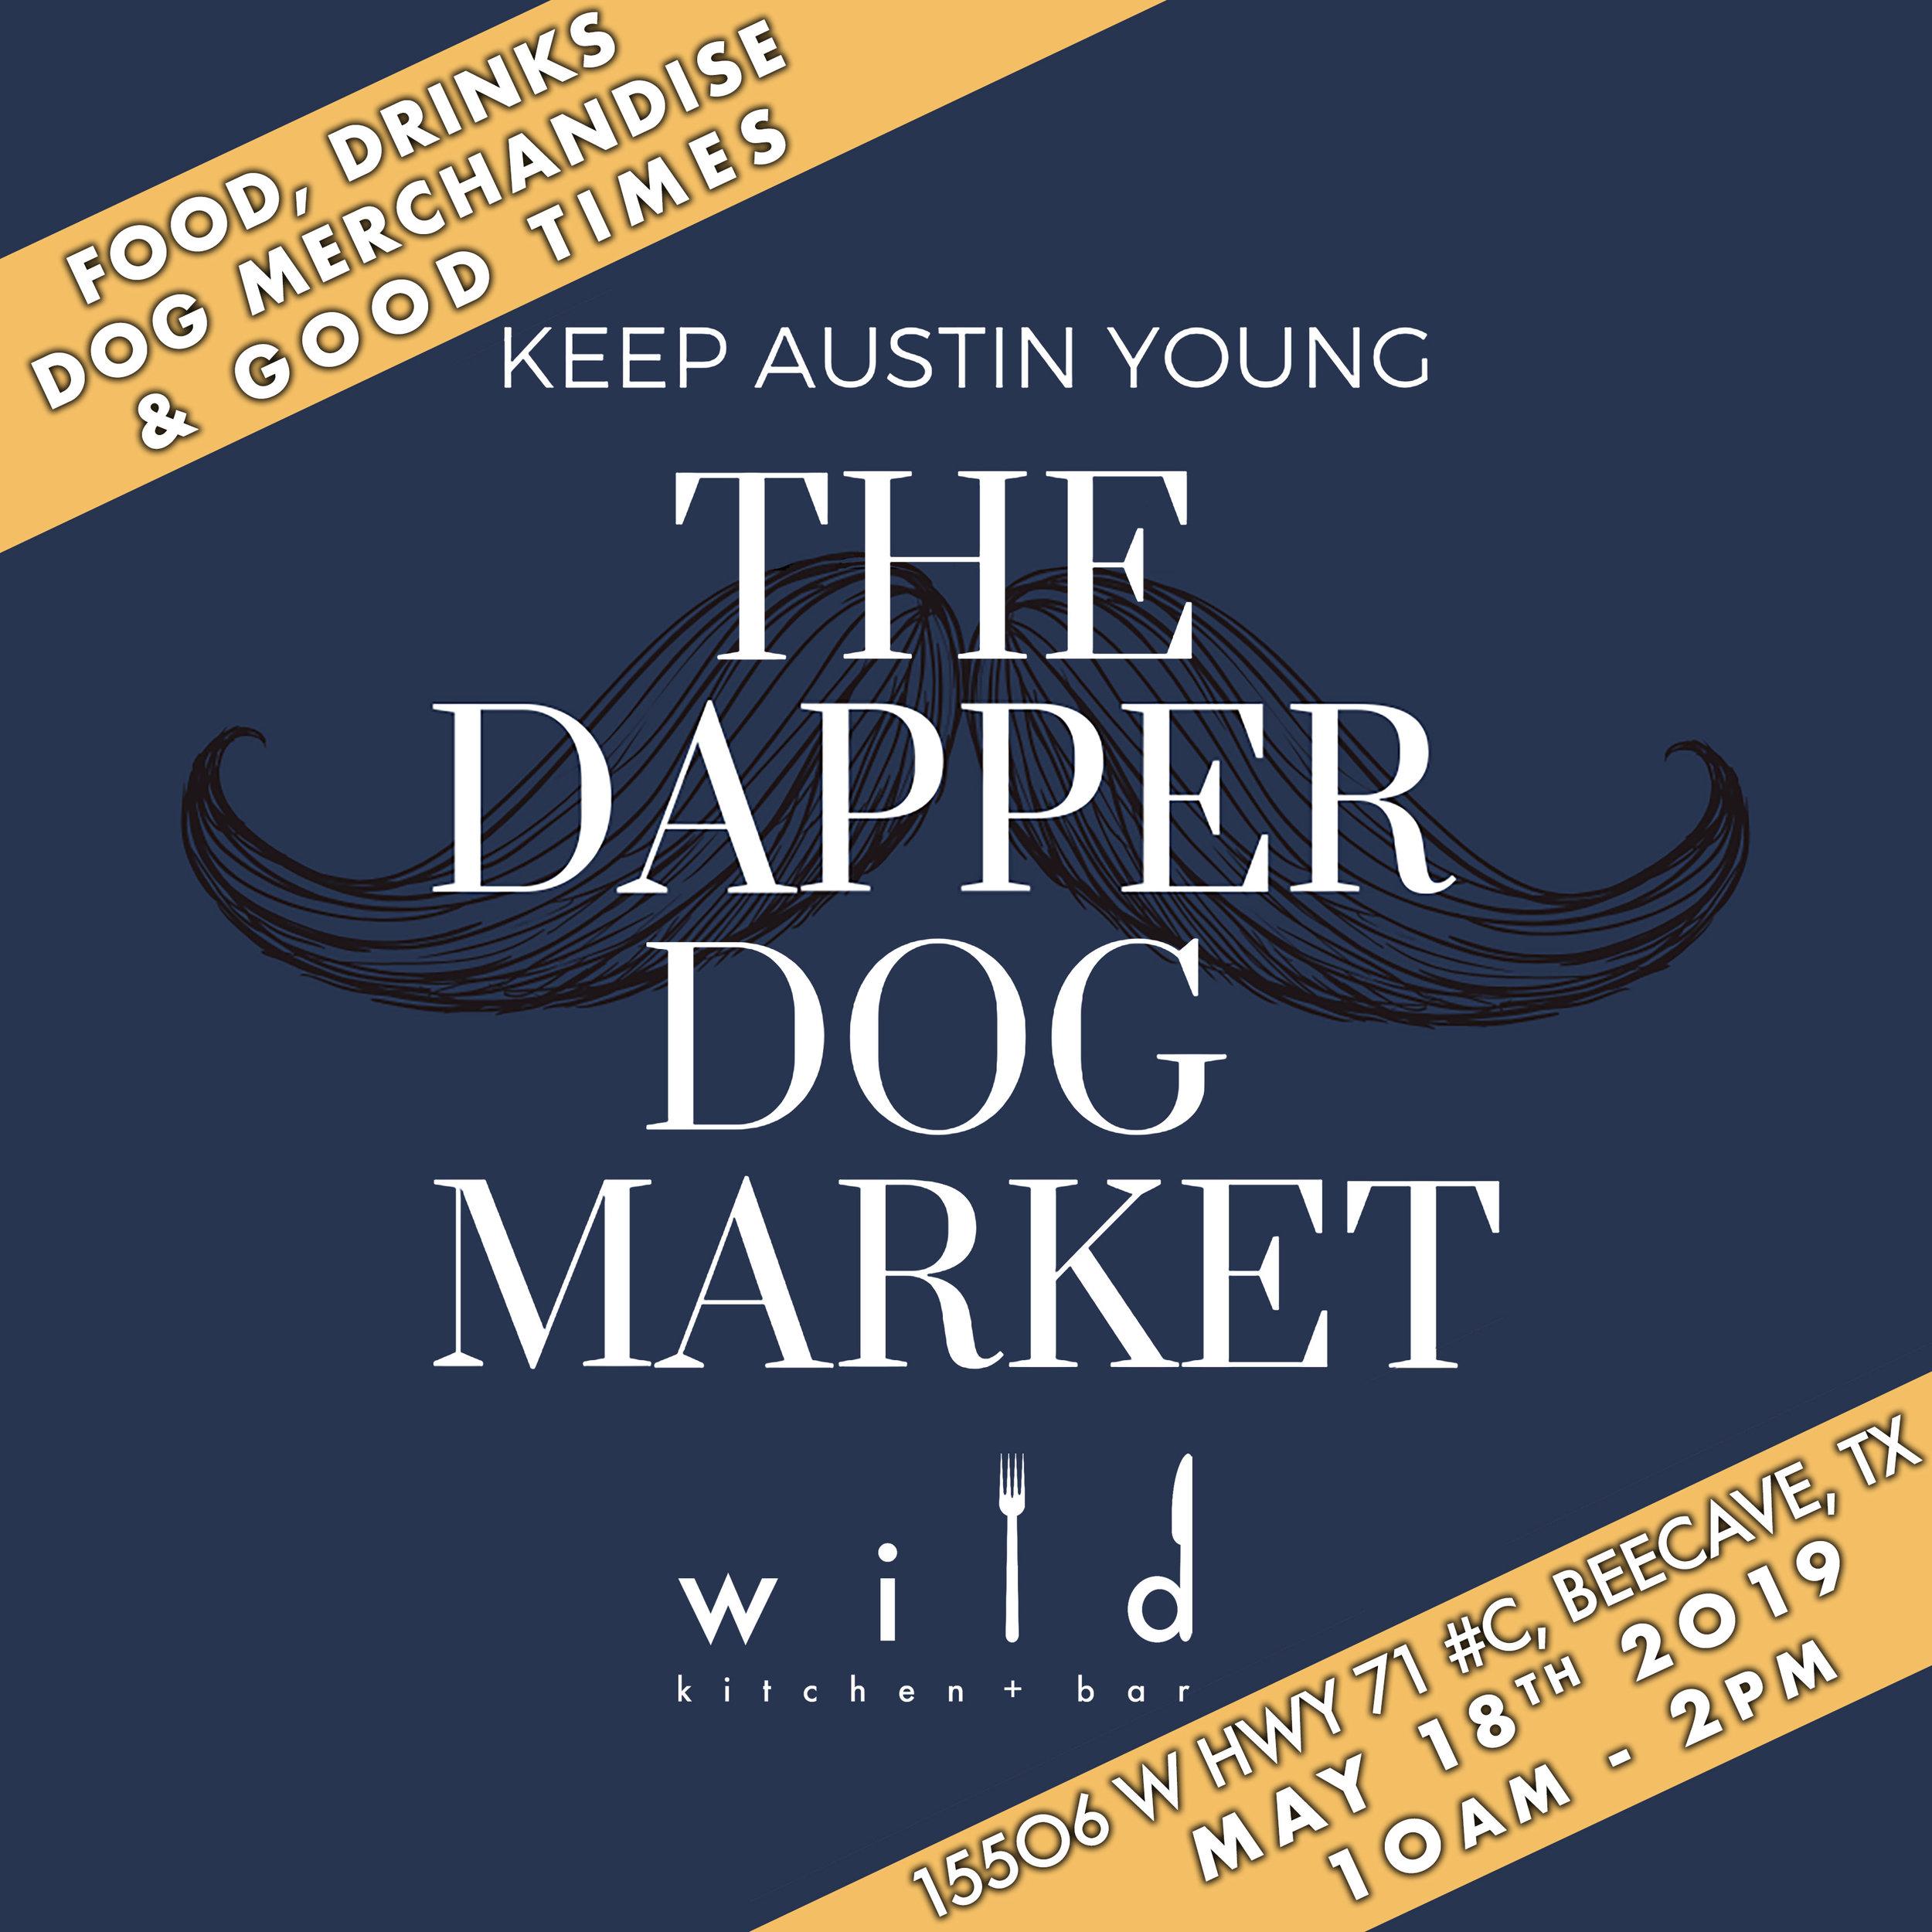 dapperdogmarket_18th.jpg